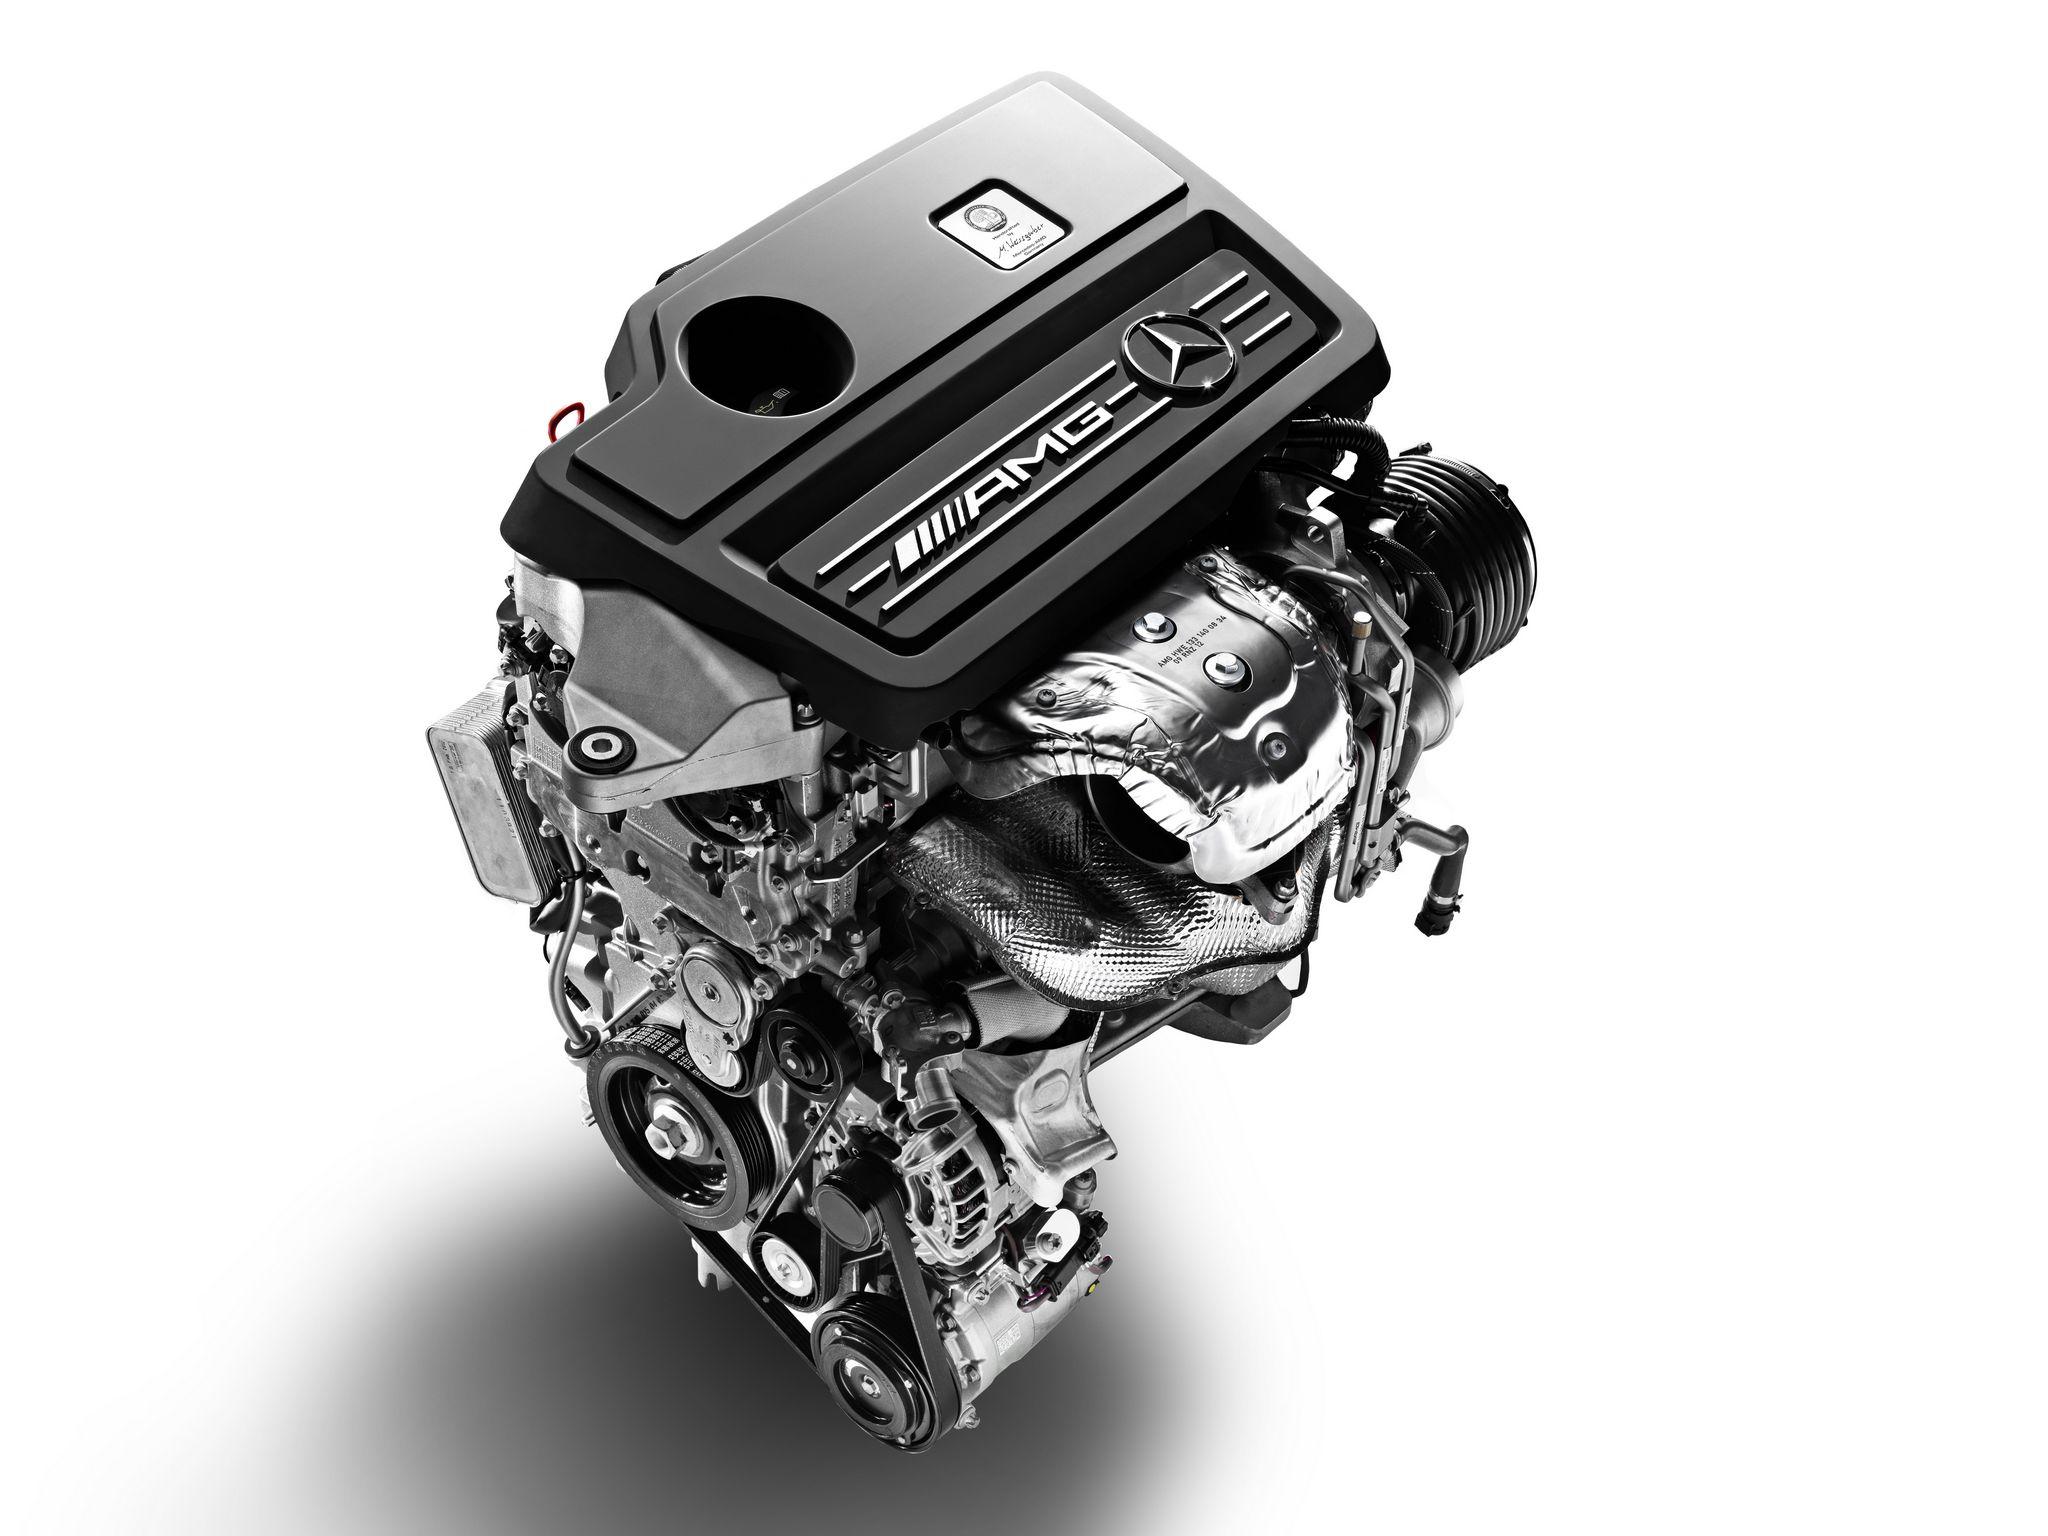 m133 the first four cylinder turbo mercedes amg engine. Black Bedroom Furniture Sets. Home Design Ideas